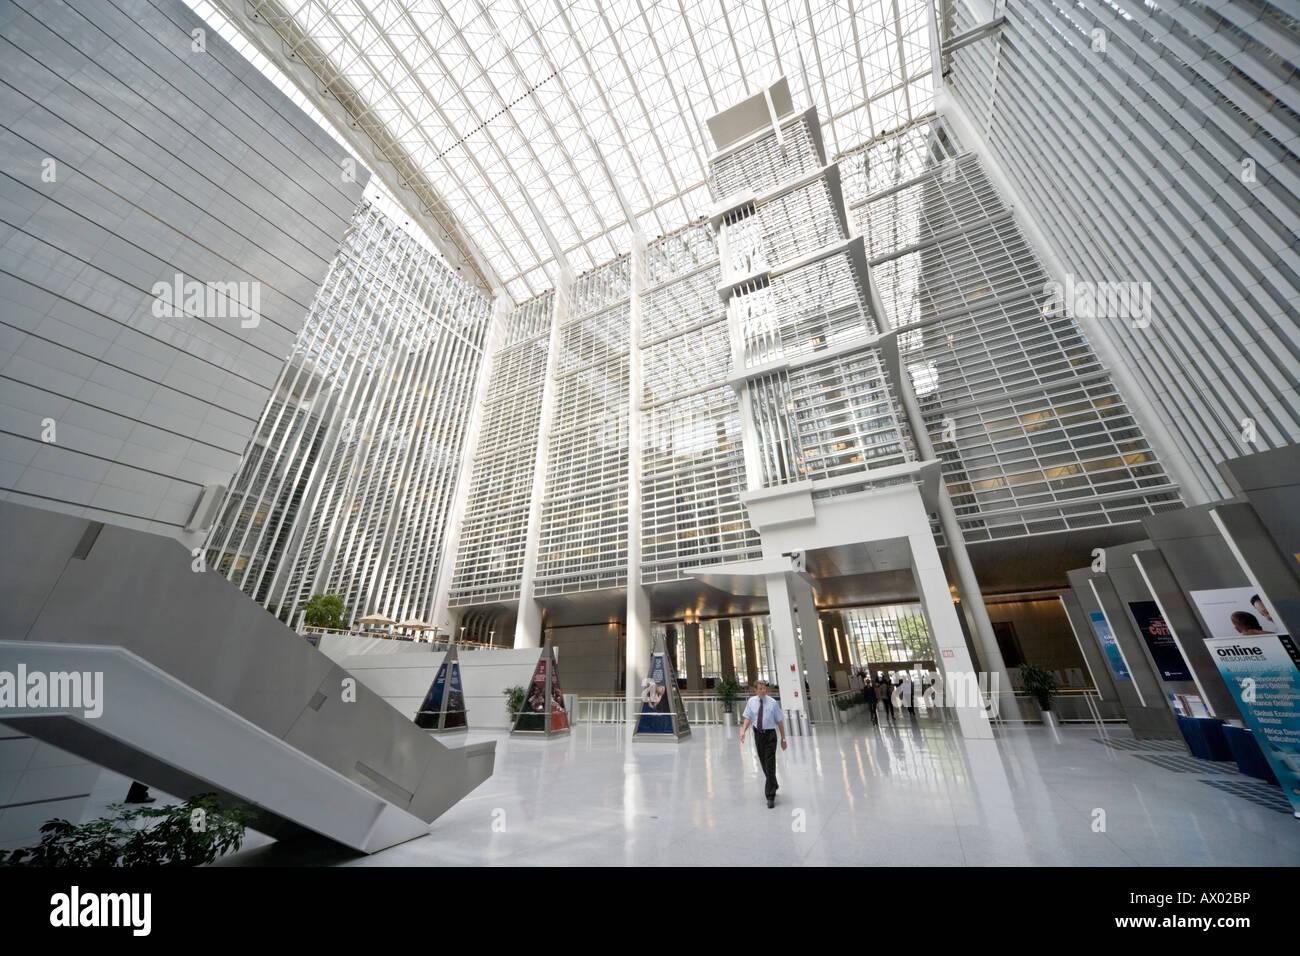 World Bank Group HQ main building atrium interior Washington DC USA - Stock Image